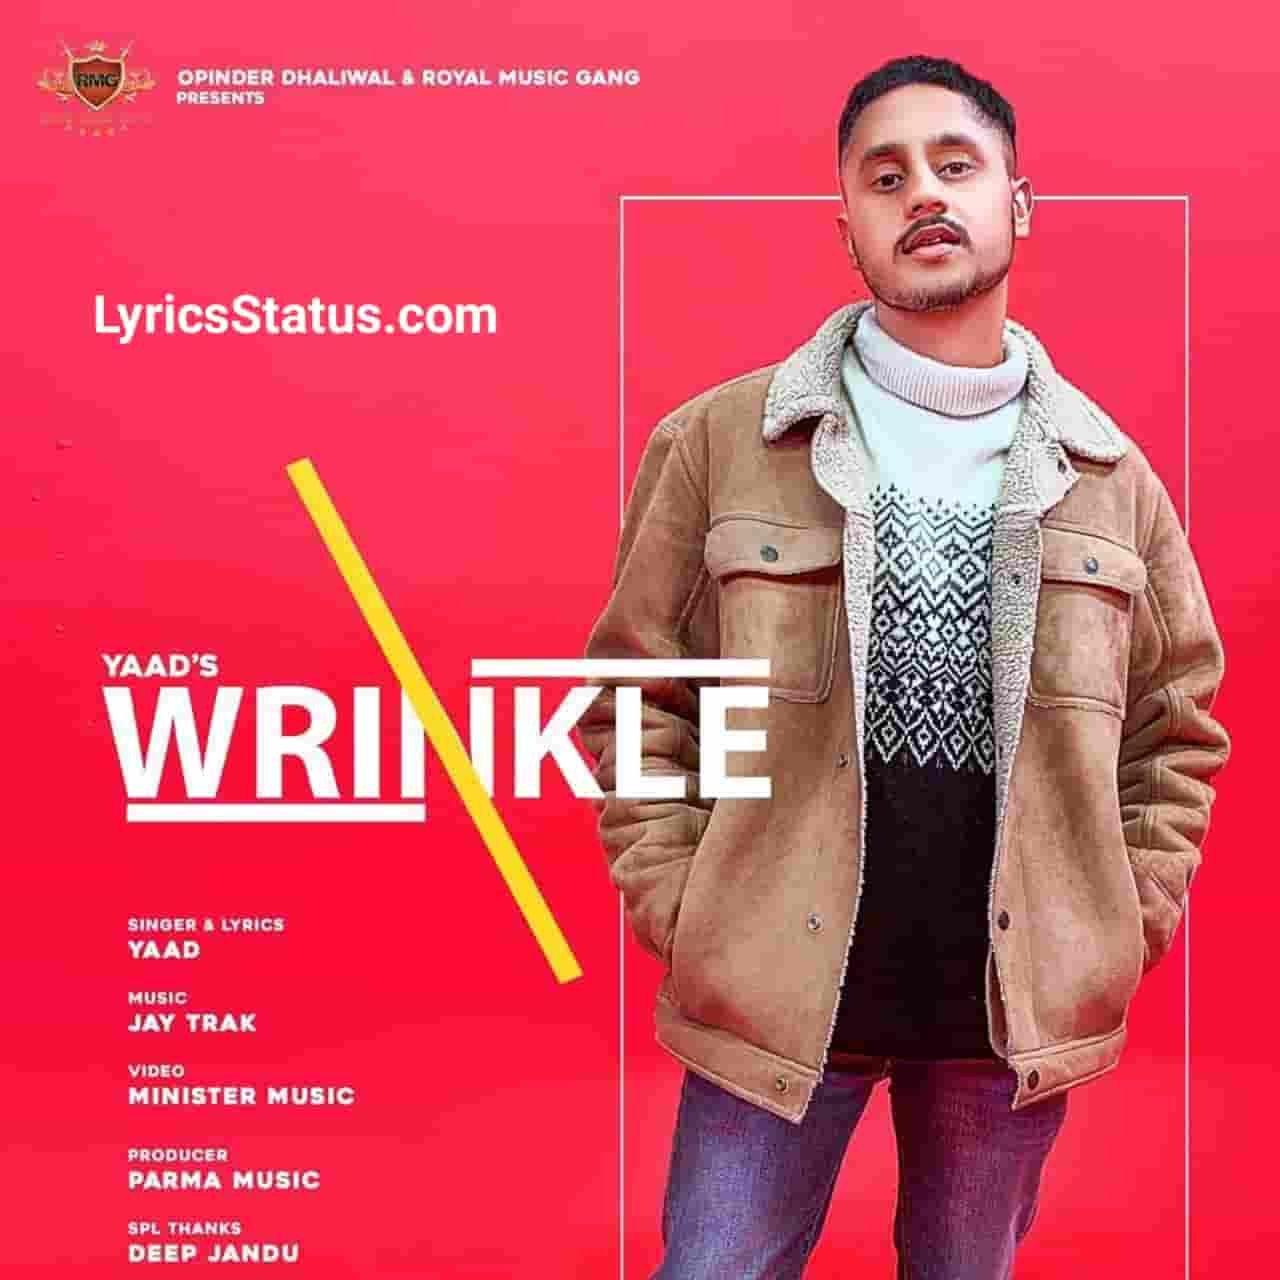 Yaad Wrinkle Karan Aujla Lyrics Status Download Fikran ch pen ge wrinkle tere ni Soch soch karde ki jatt balliye punjabi song Wrinkle Yaad Purewal